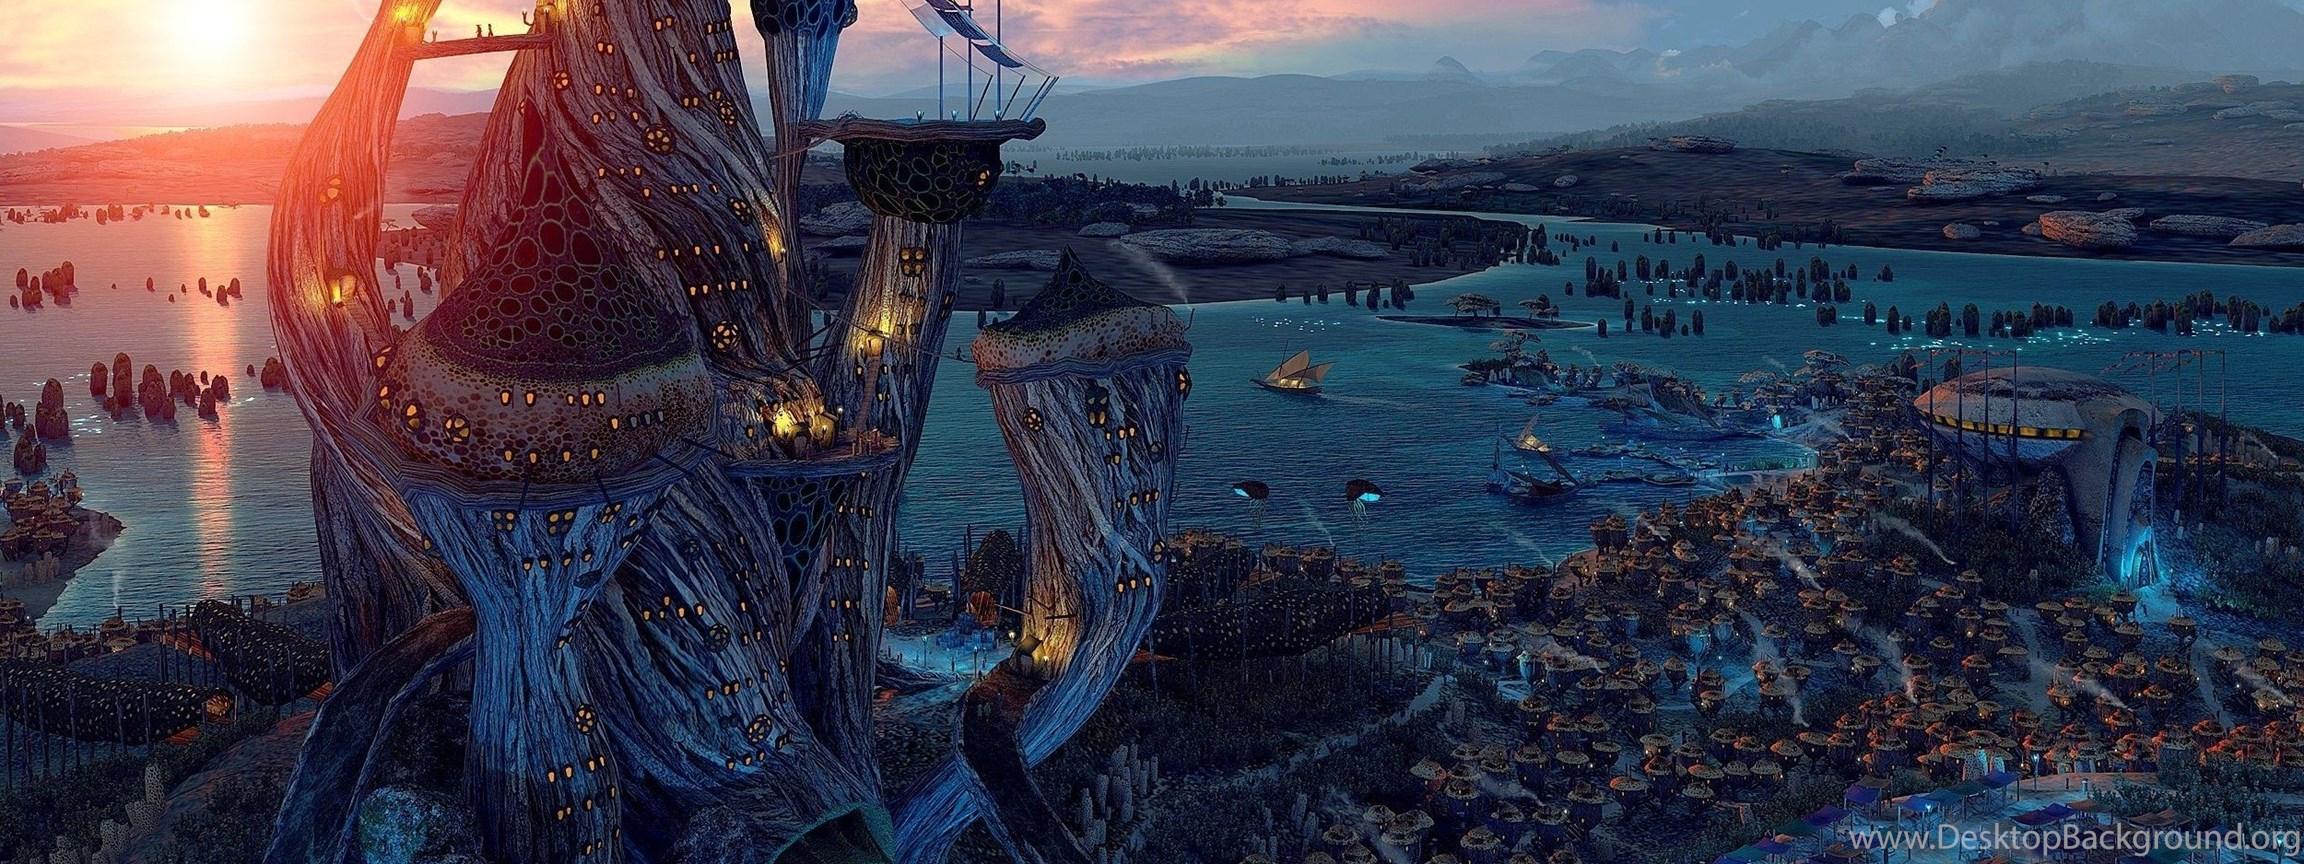 The Elder Scrolls III Morrowind Wallpapers HD Desktop And